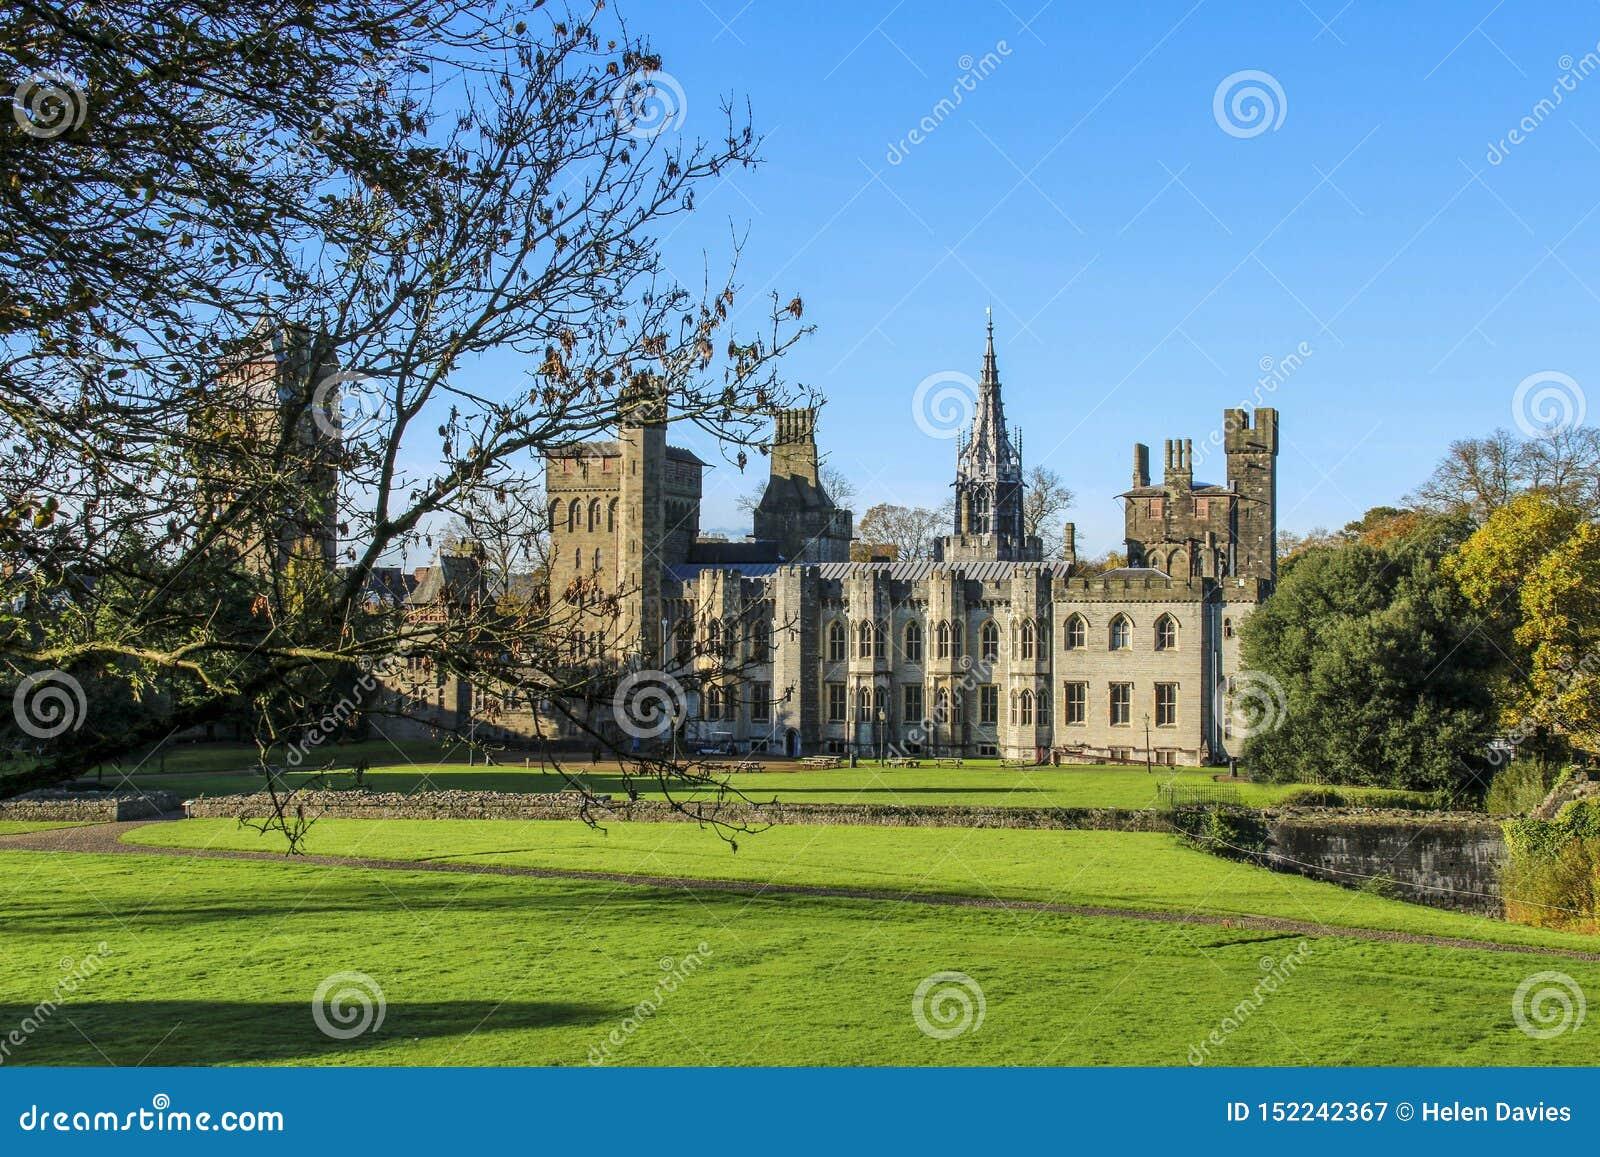 Cardiff slottyttersida i mitten av Cardiff i höstsolskenet